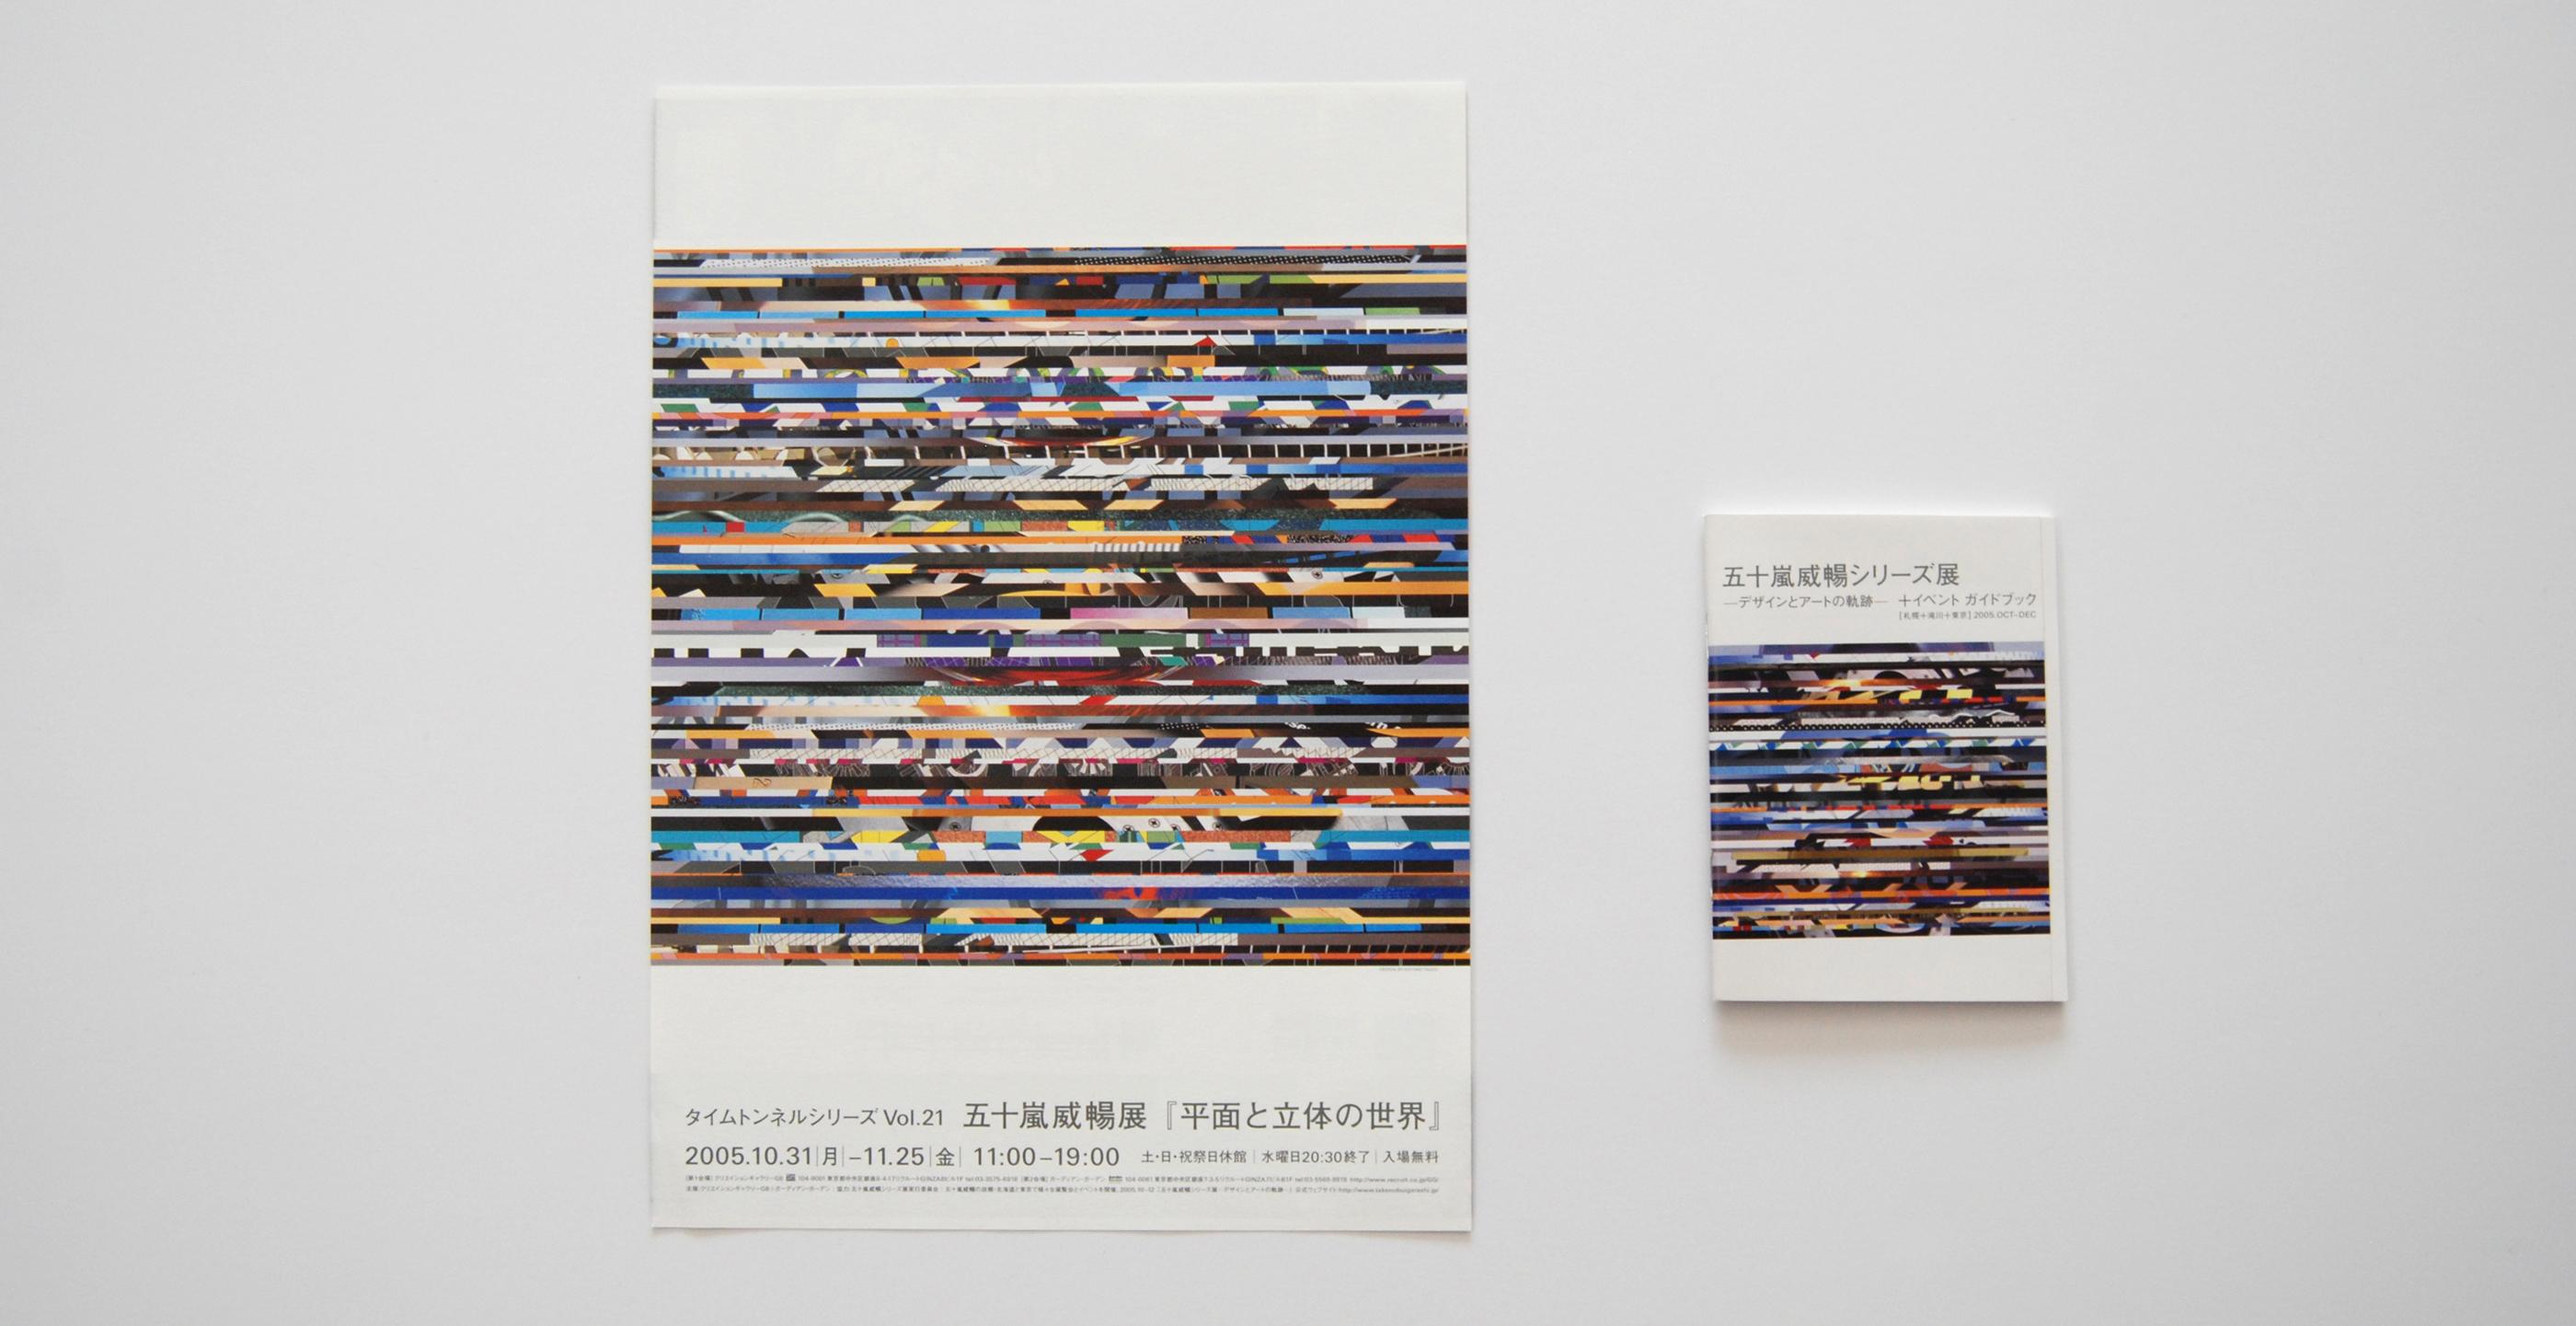 Takenobu Igarashi posters